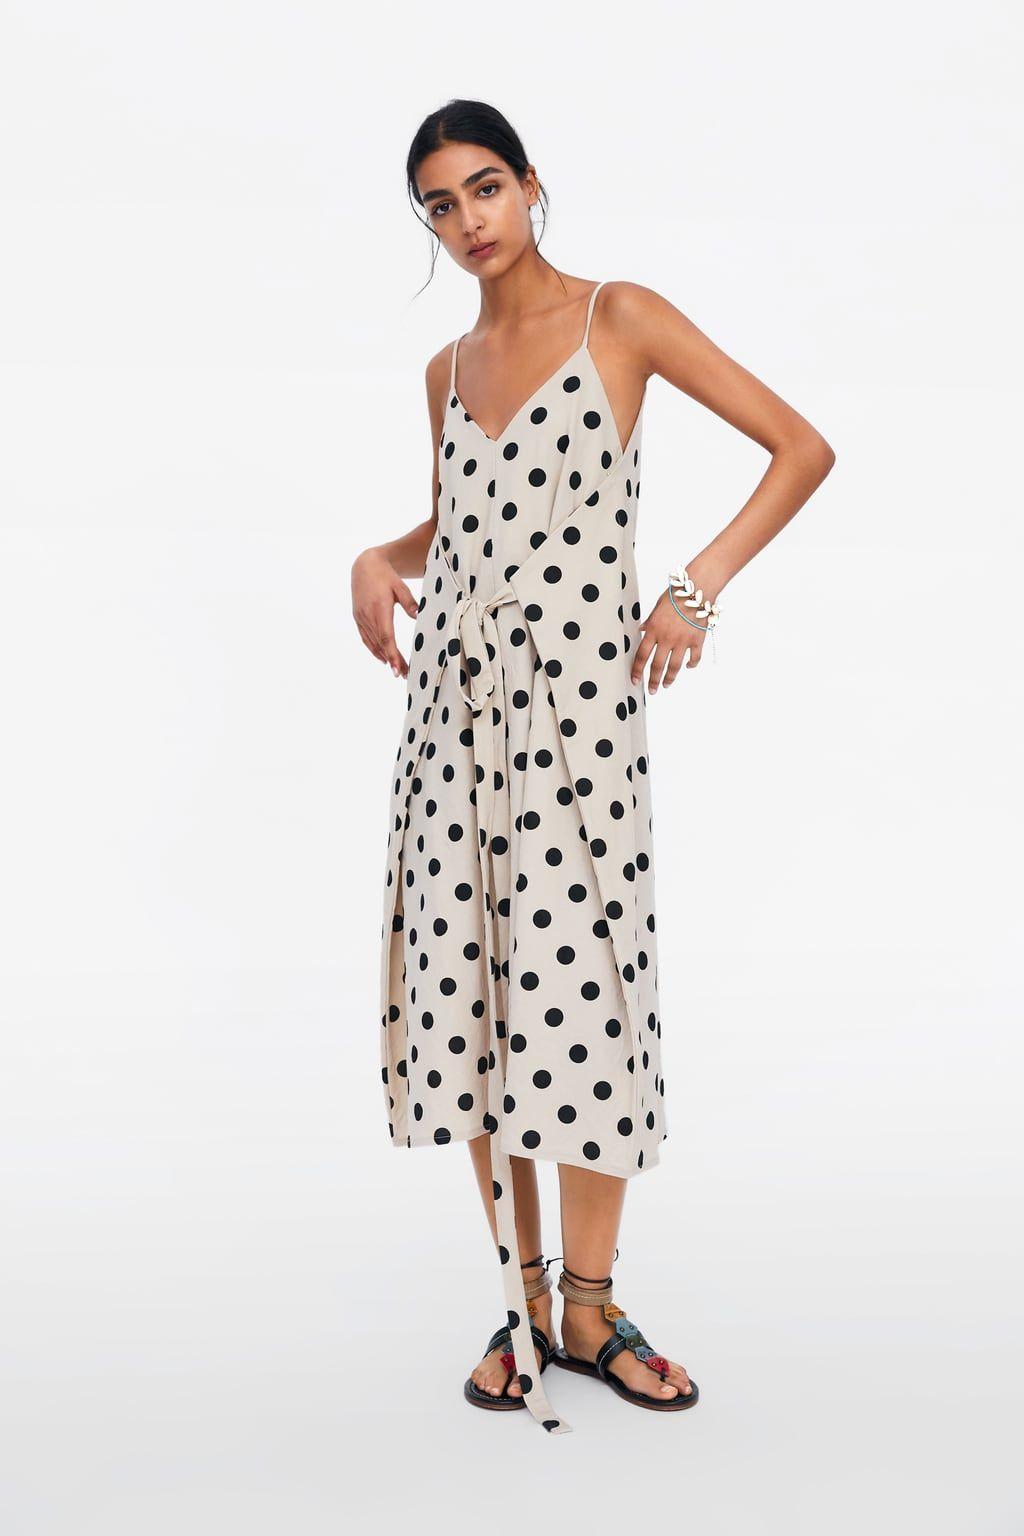 4977fdb5 Polka dot dress with belt in 2019   zara 2019   Belted dress, Dot ...